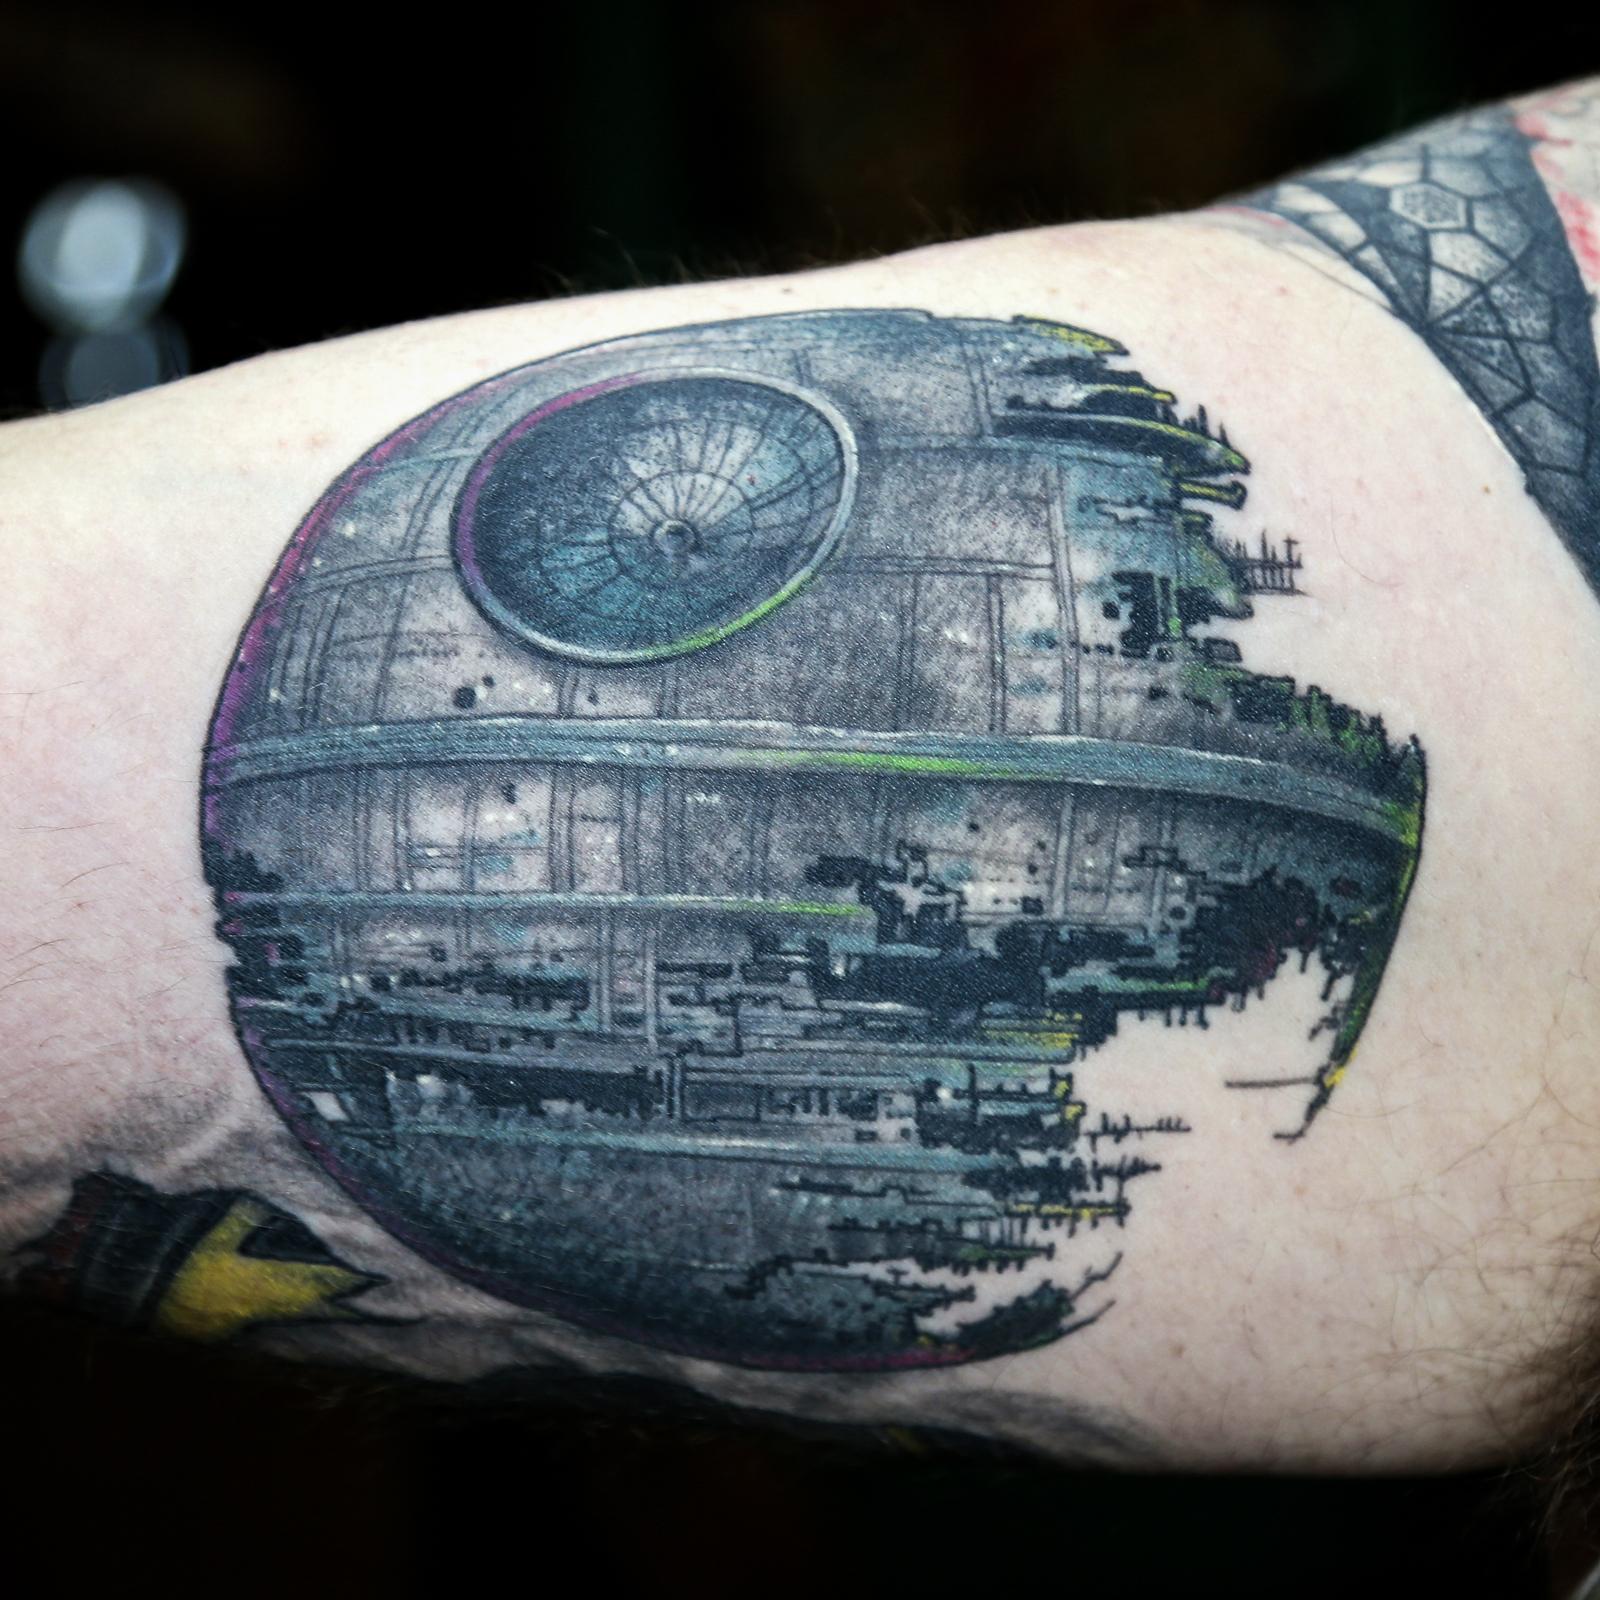 Deathstar enrique bernal ejay tattoo.jpg